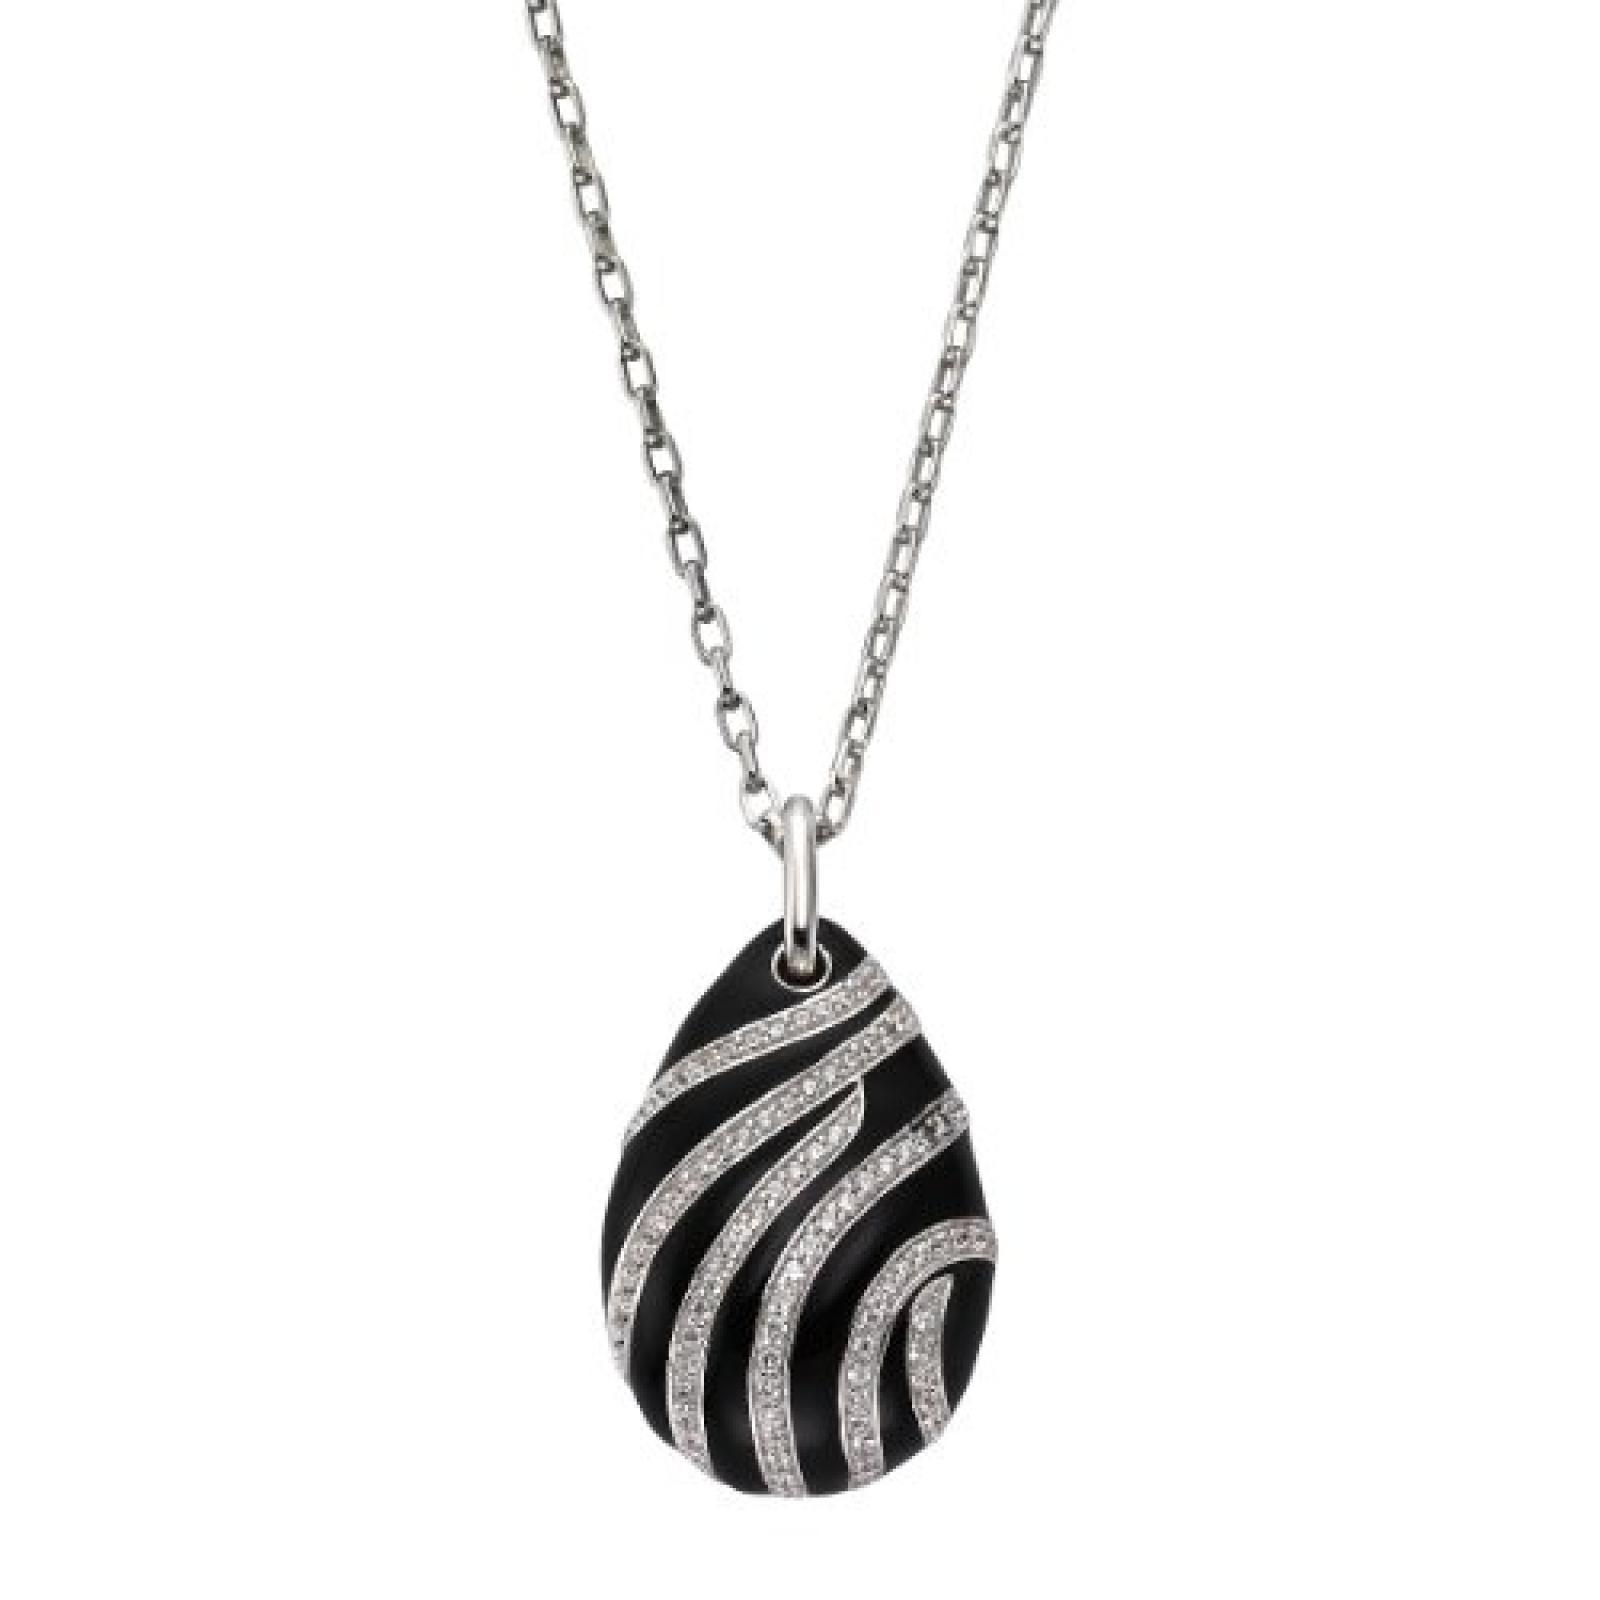 Celesta Damen Halskette 925 Sterling Silber rhodiniert Acryl Zirkonia Celesta Silver 45.0 cm weiß 500244582-45